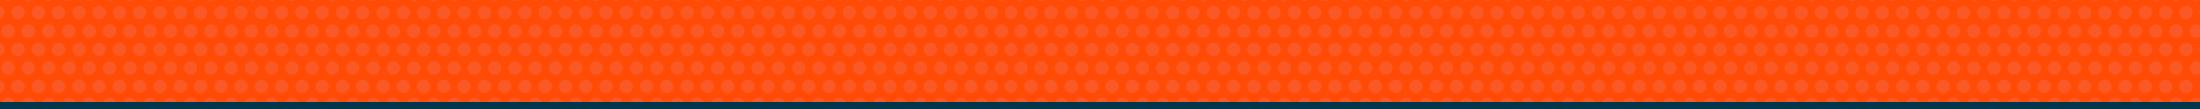 Rectángulo naranja